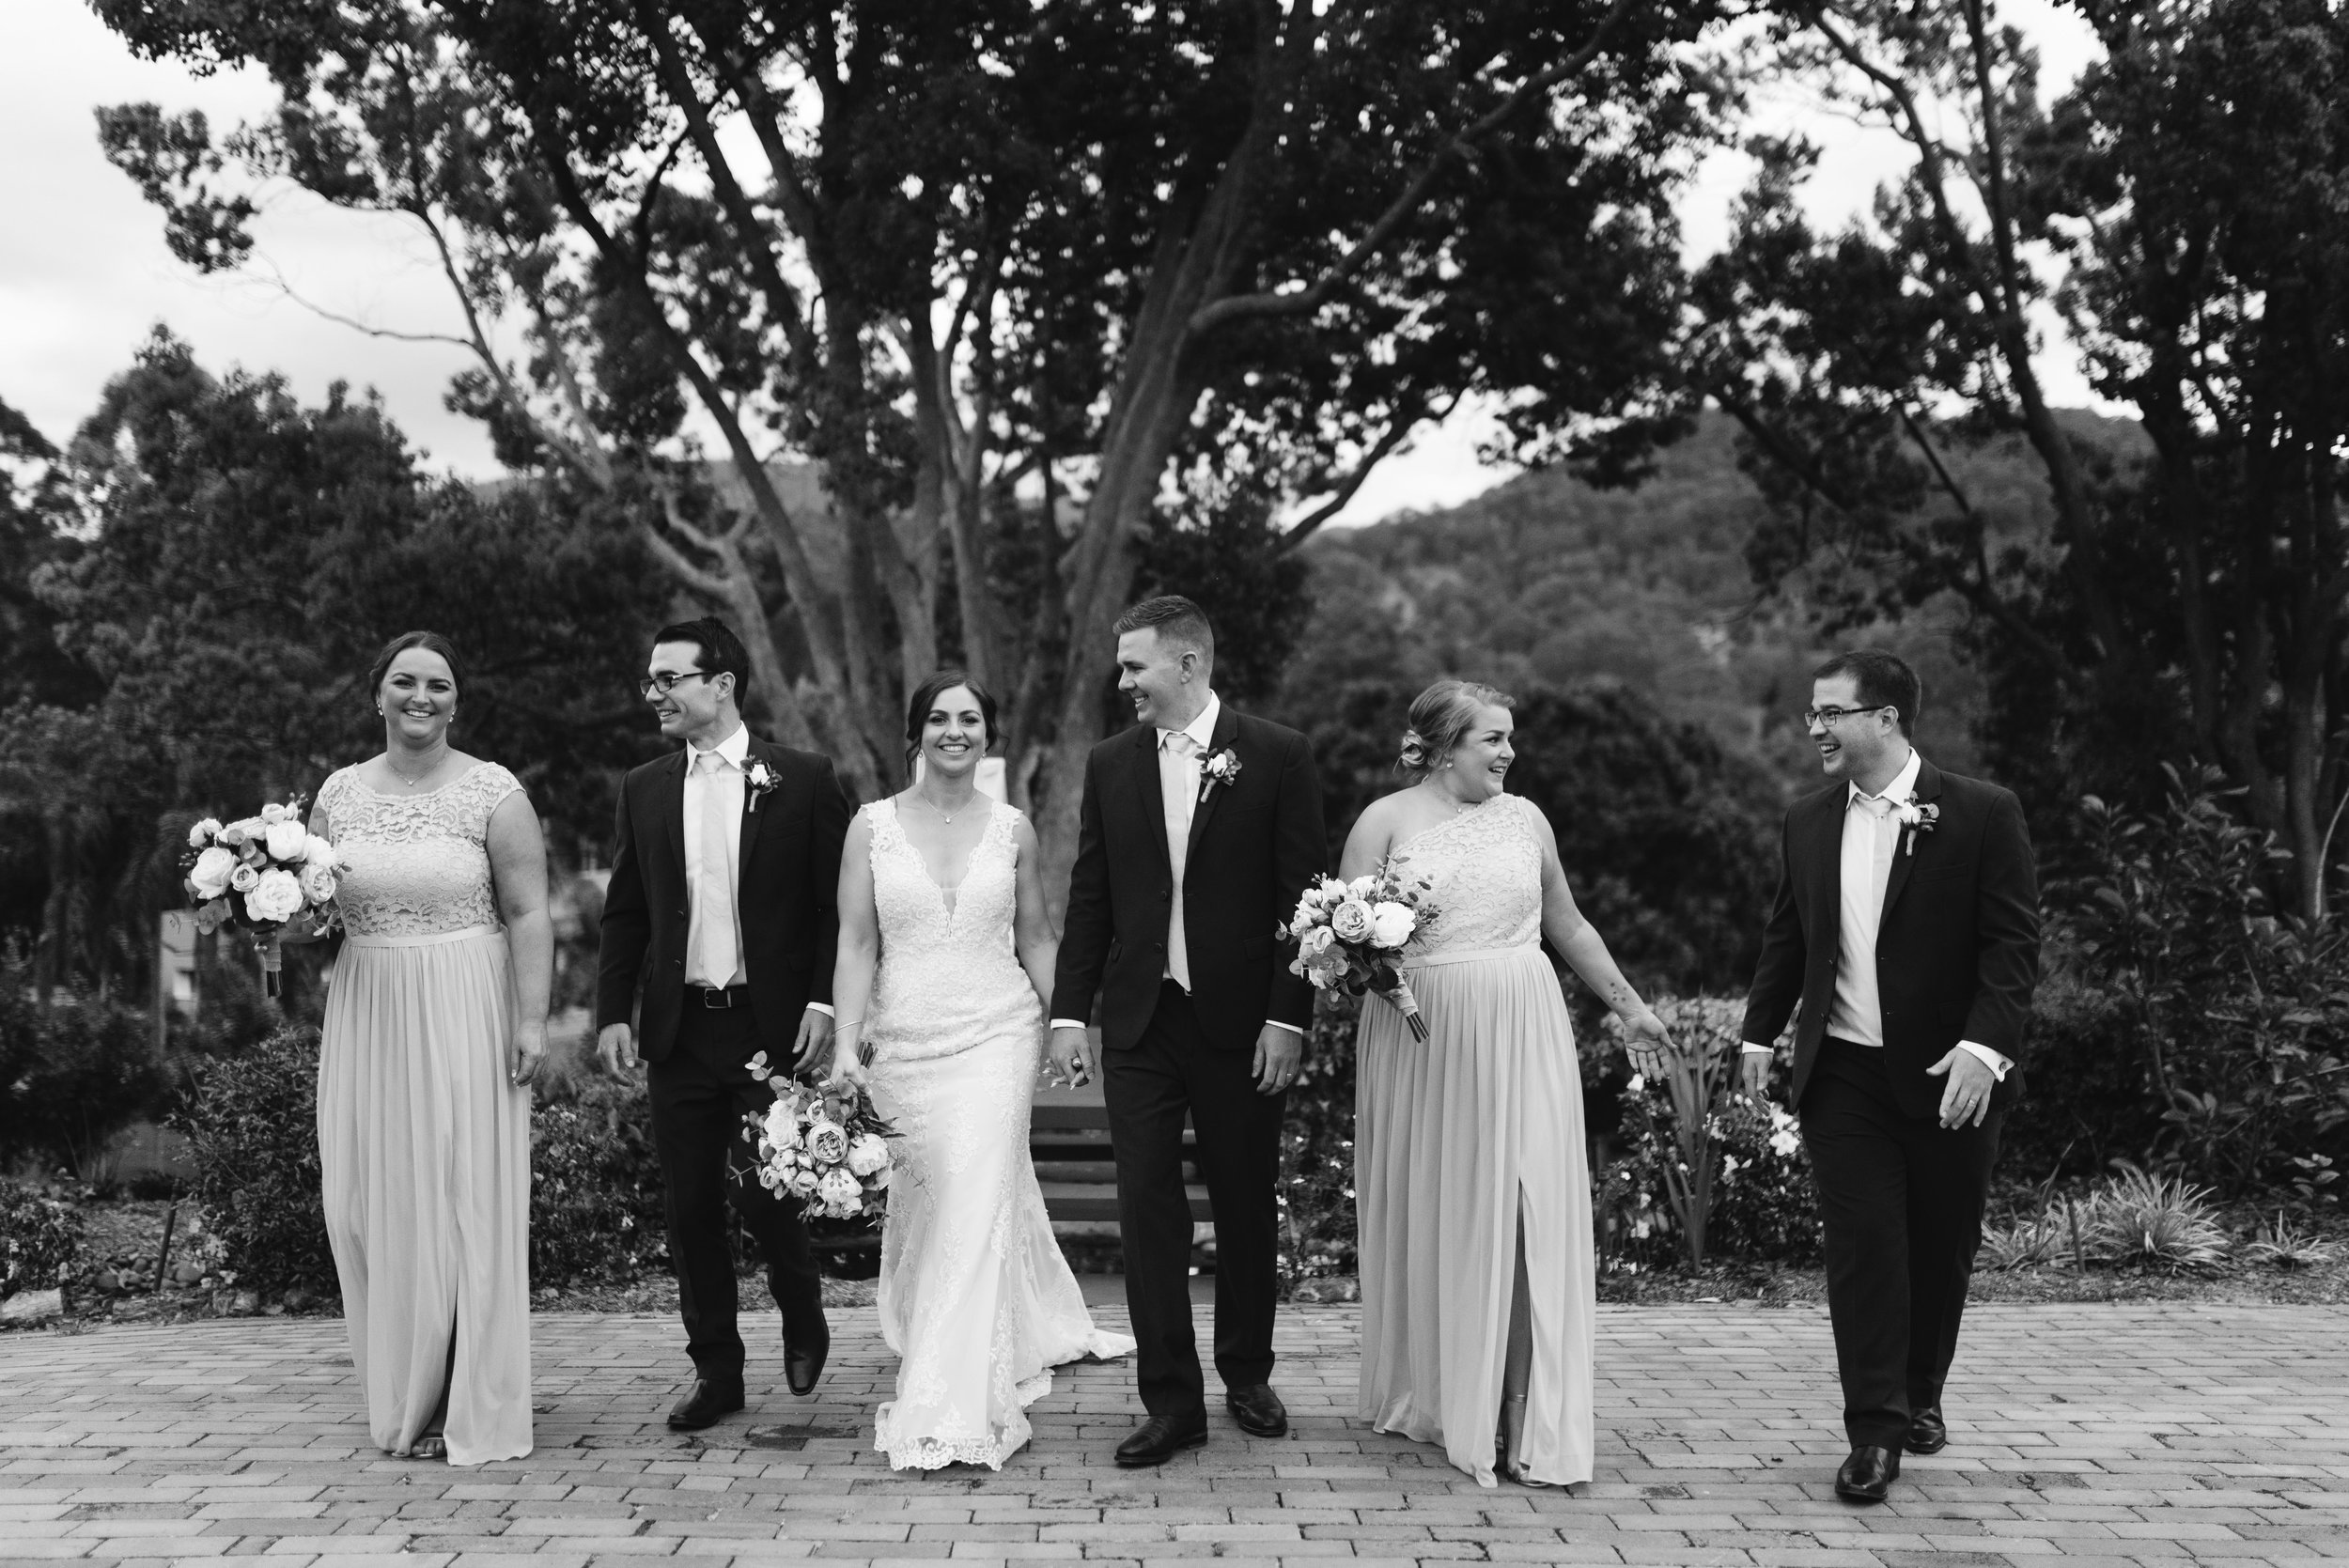 LAURENOLIVIA-austinvilla-estate-wedding-61.jpg